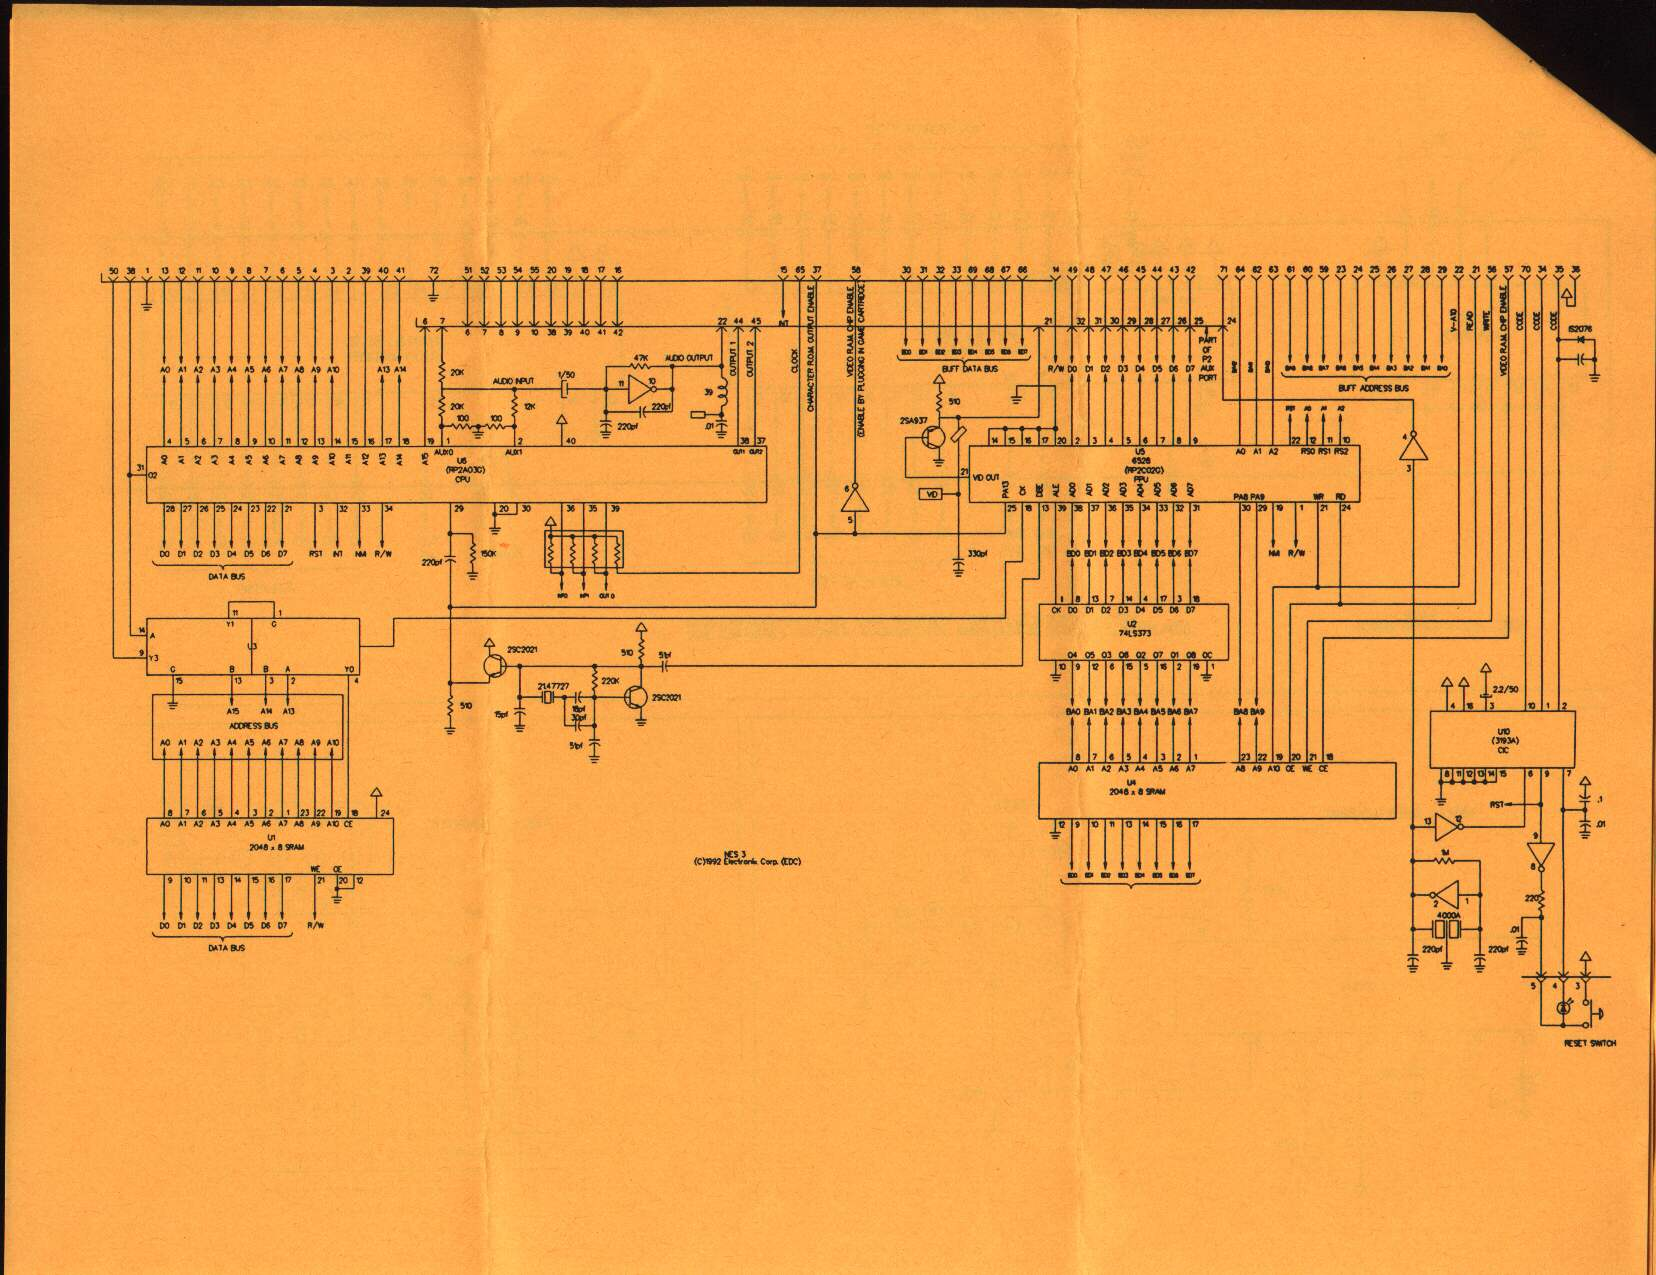 NESHQ - General NES Hardware Information on